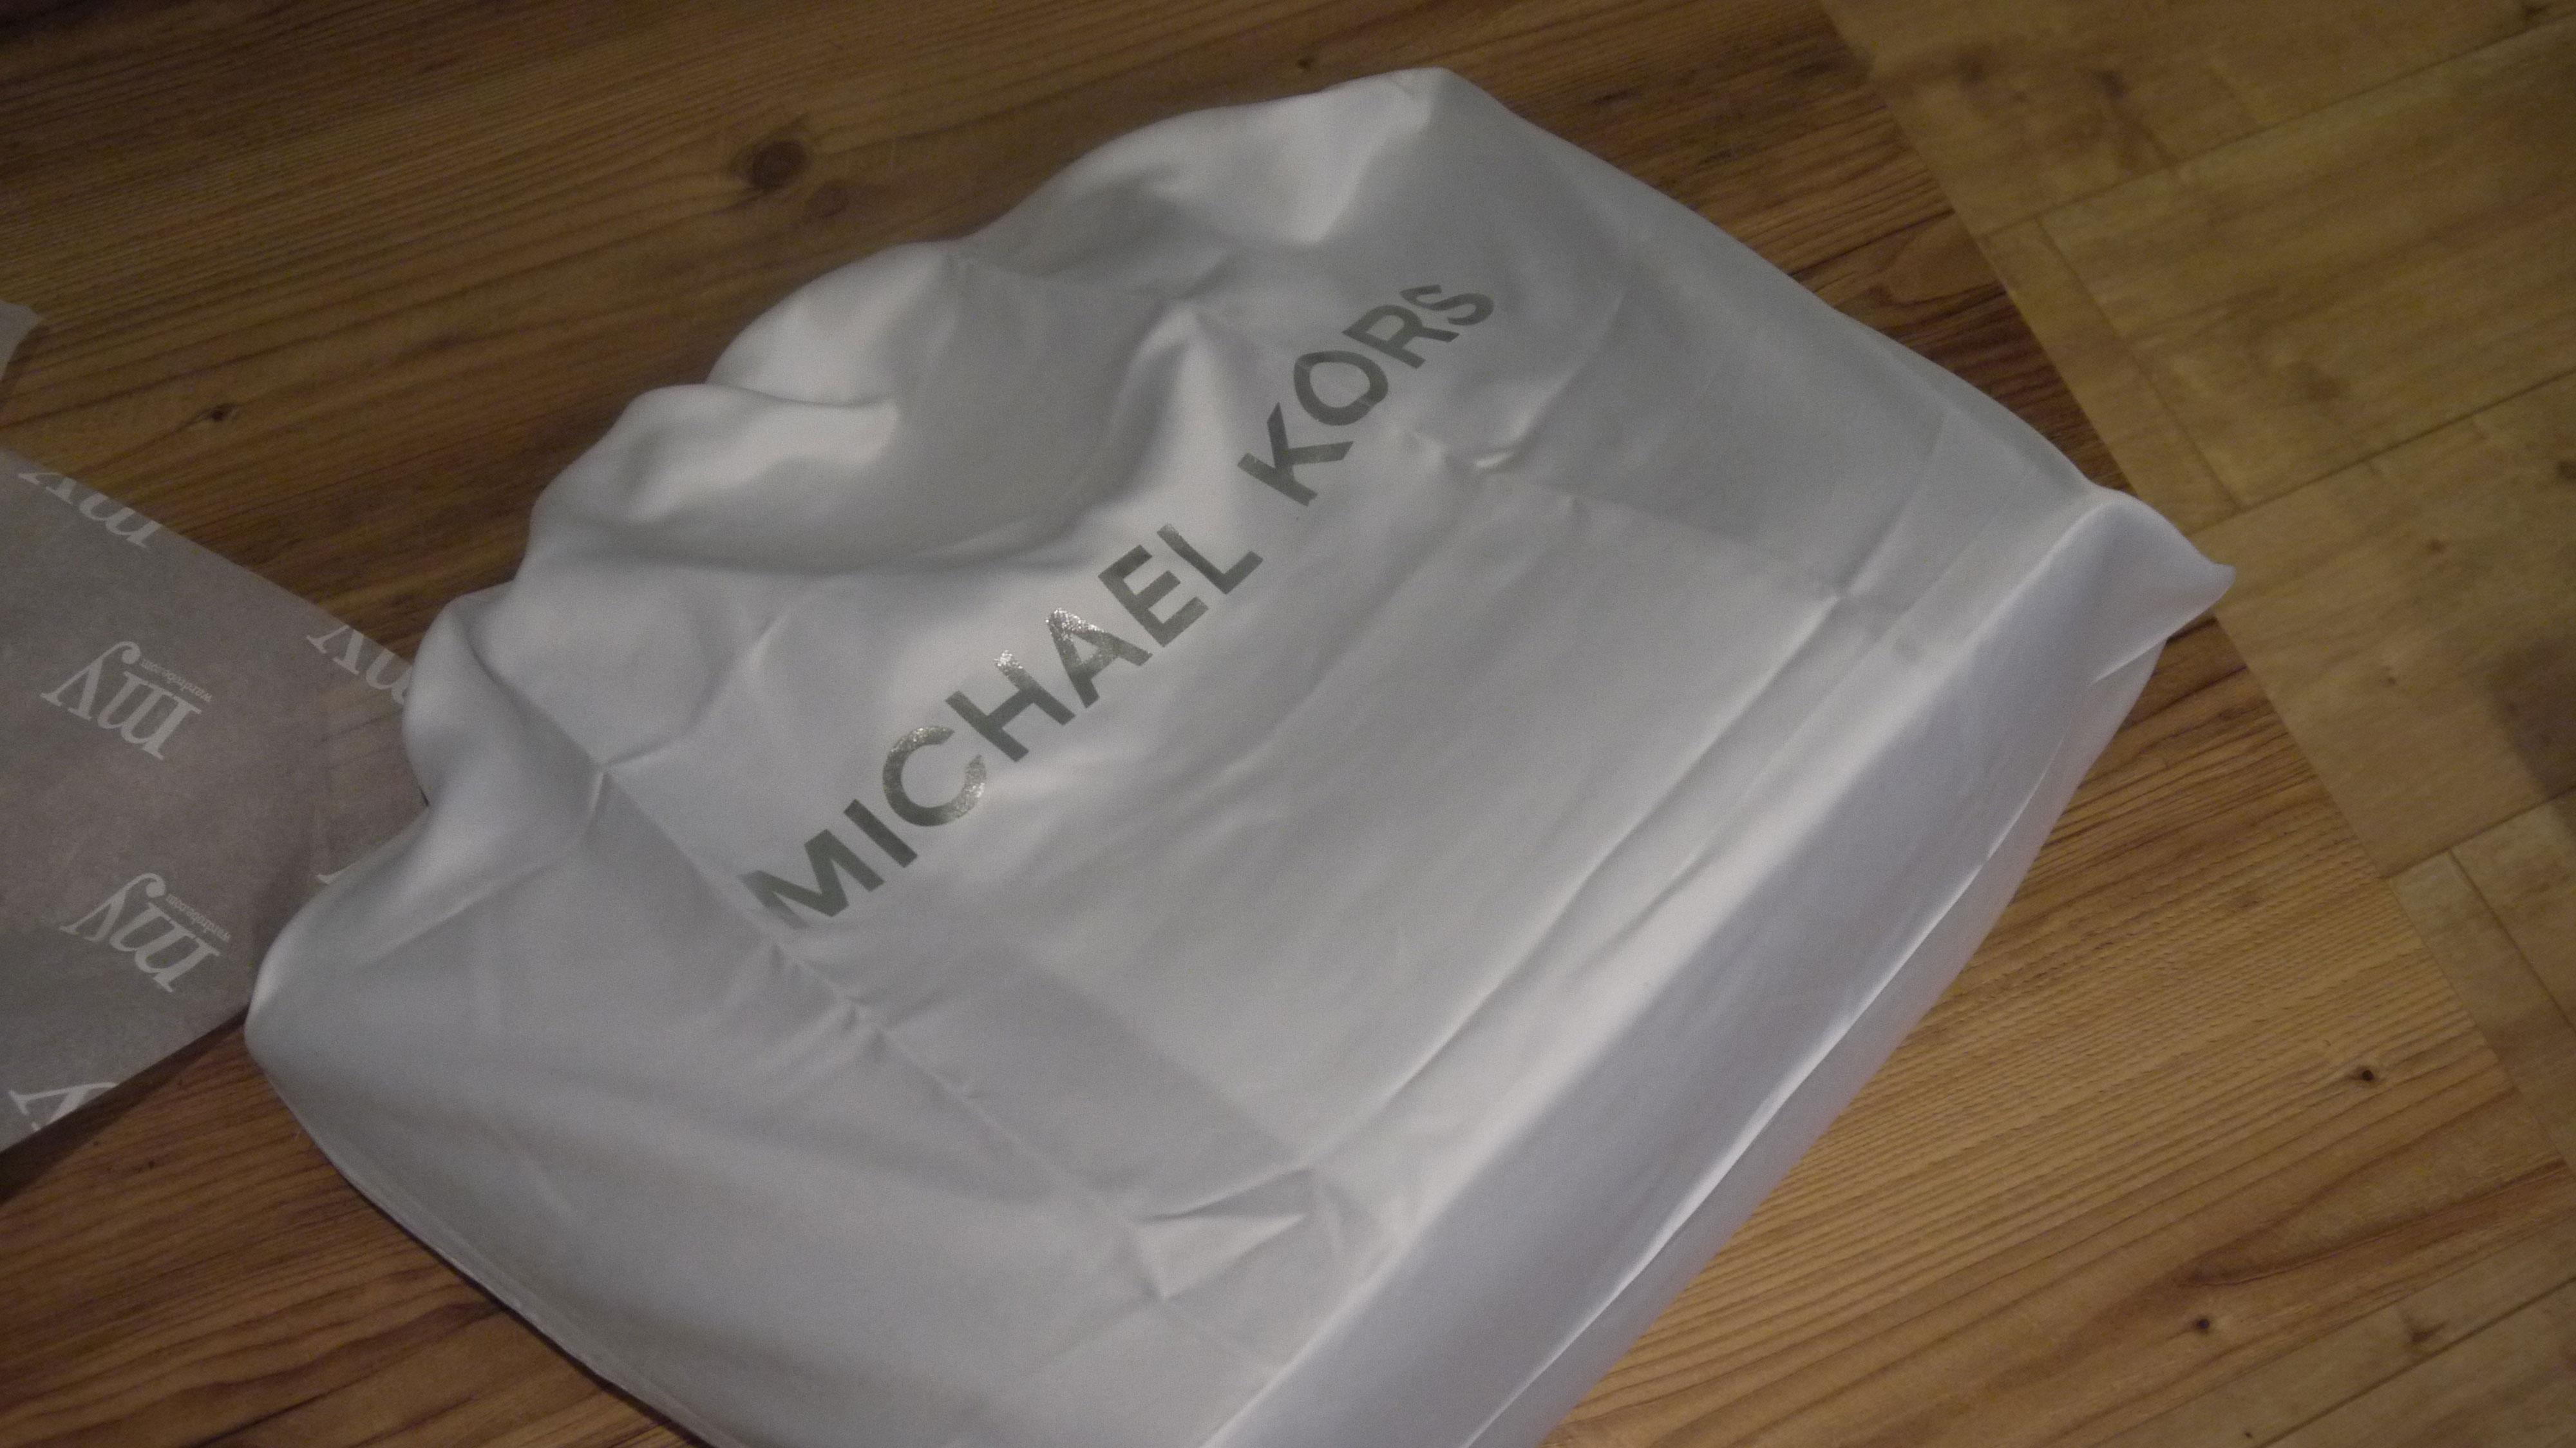 michael-kors-tricolor-my-wardrobe-dustbag